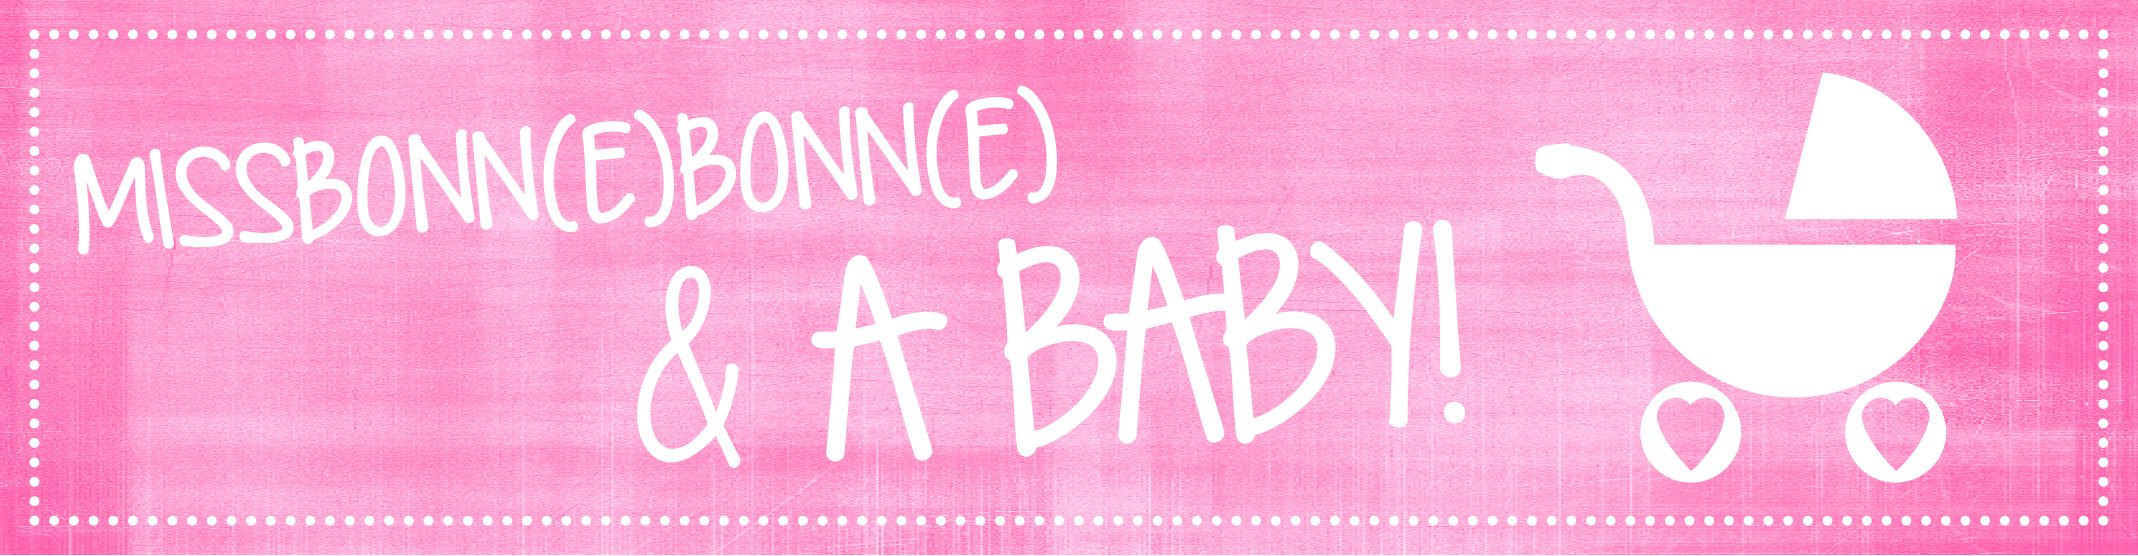 Am Vatertag wird aus MissBB: MissBonne(e)Bonn(e) & a baby <3